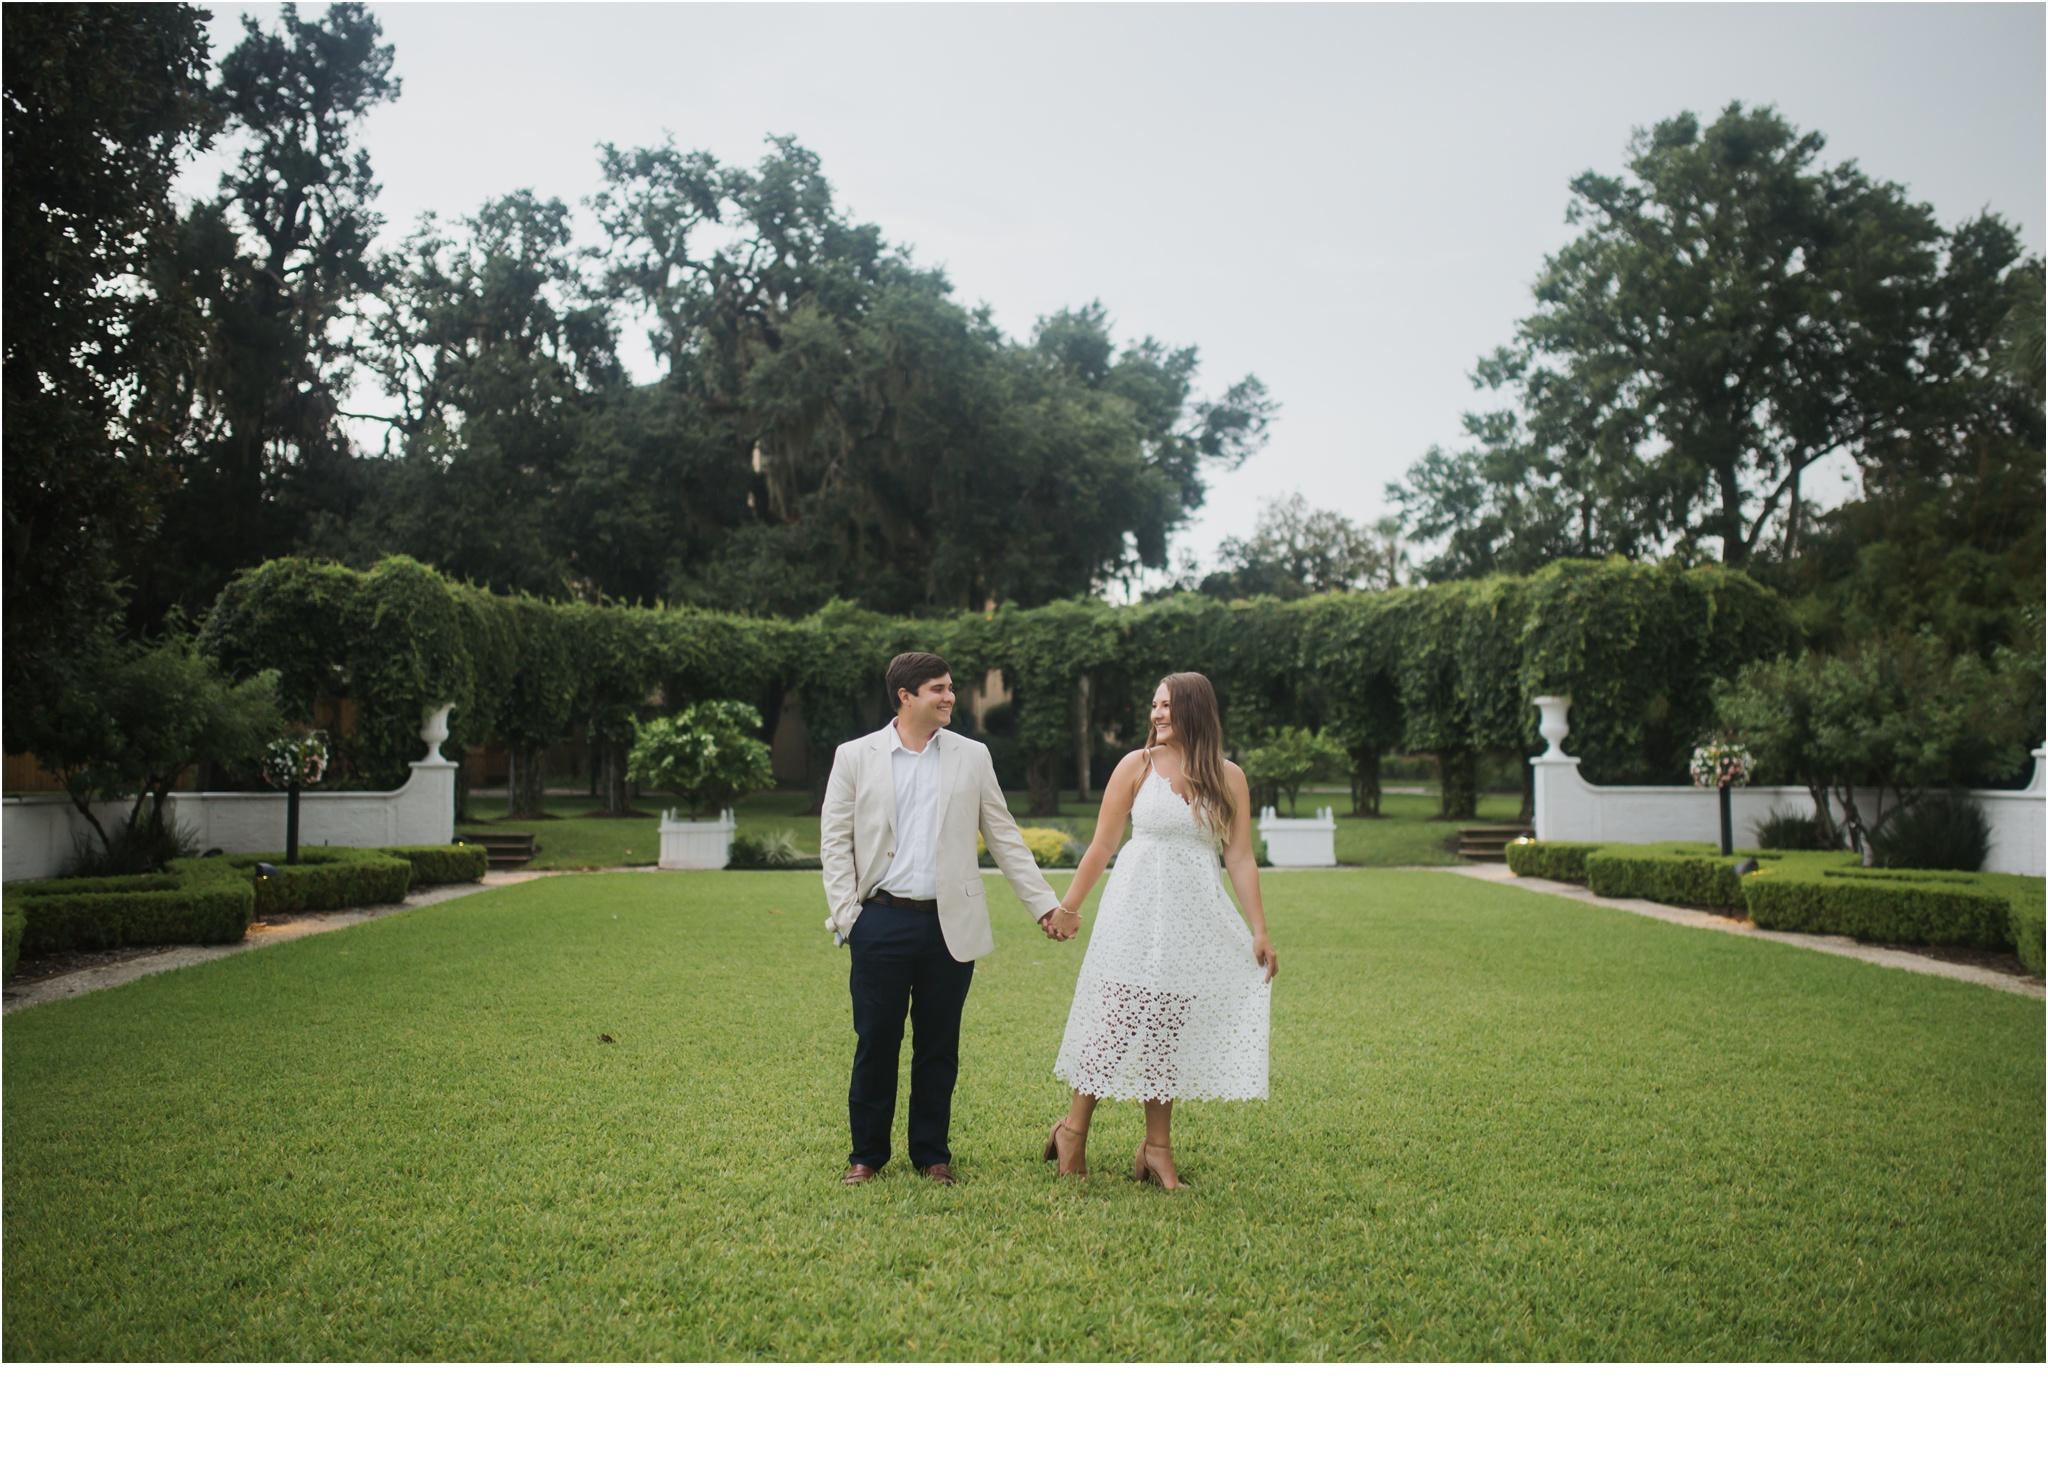 Rainey_Gregg_Photography_St._Simons_Island_Georgia_California_Wedding_Portrait_Photography_1130.jpg